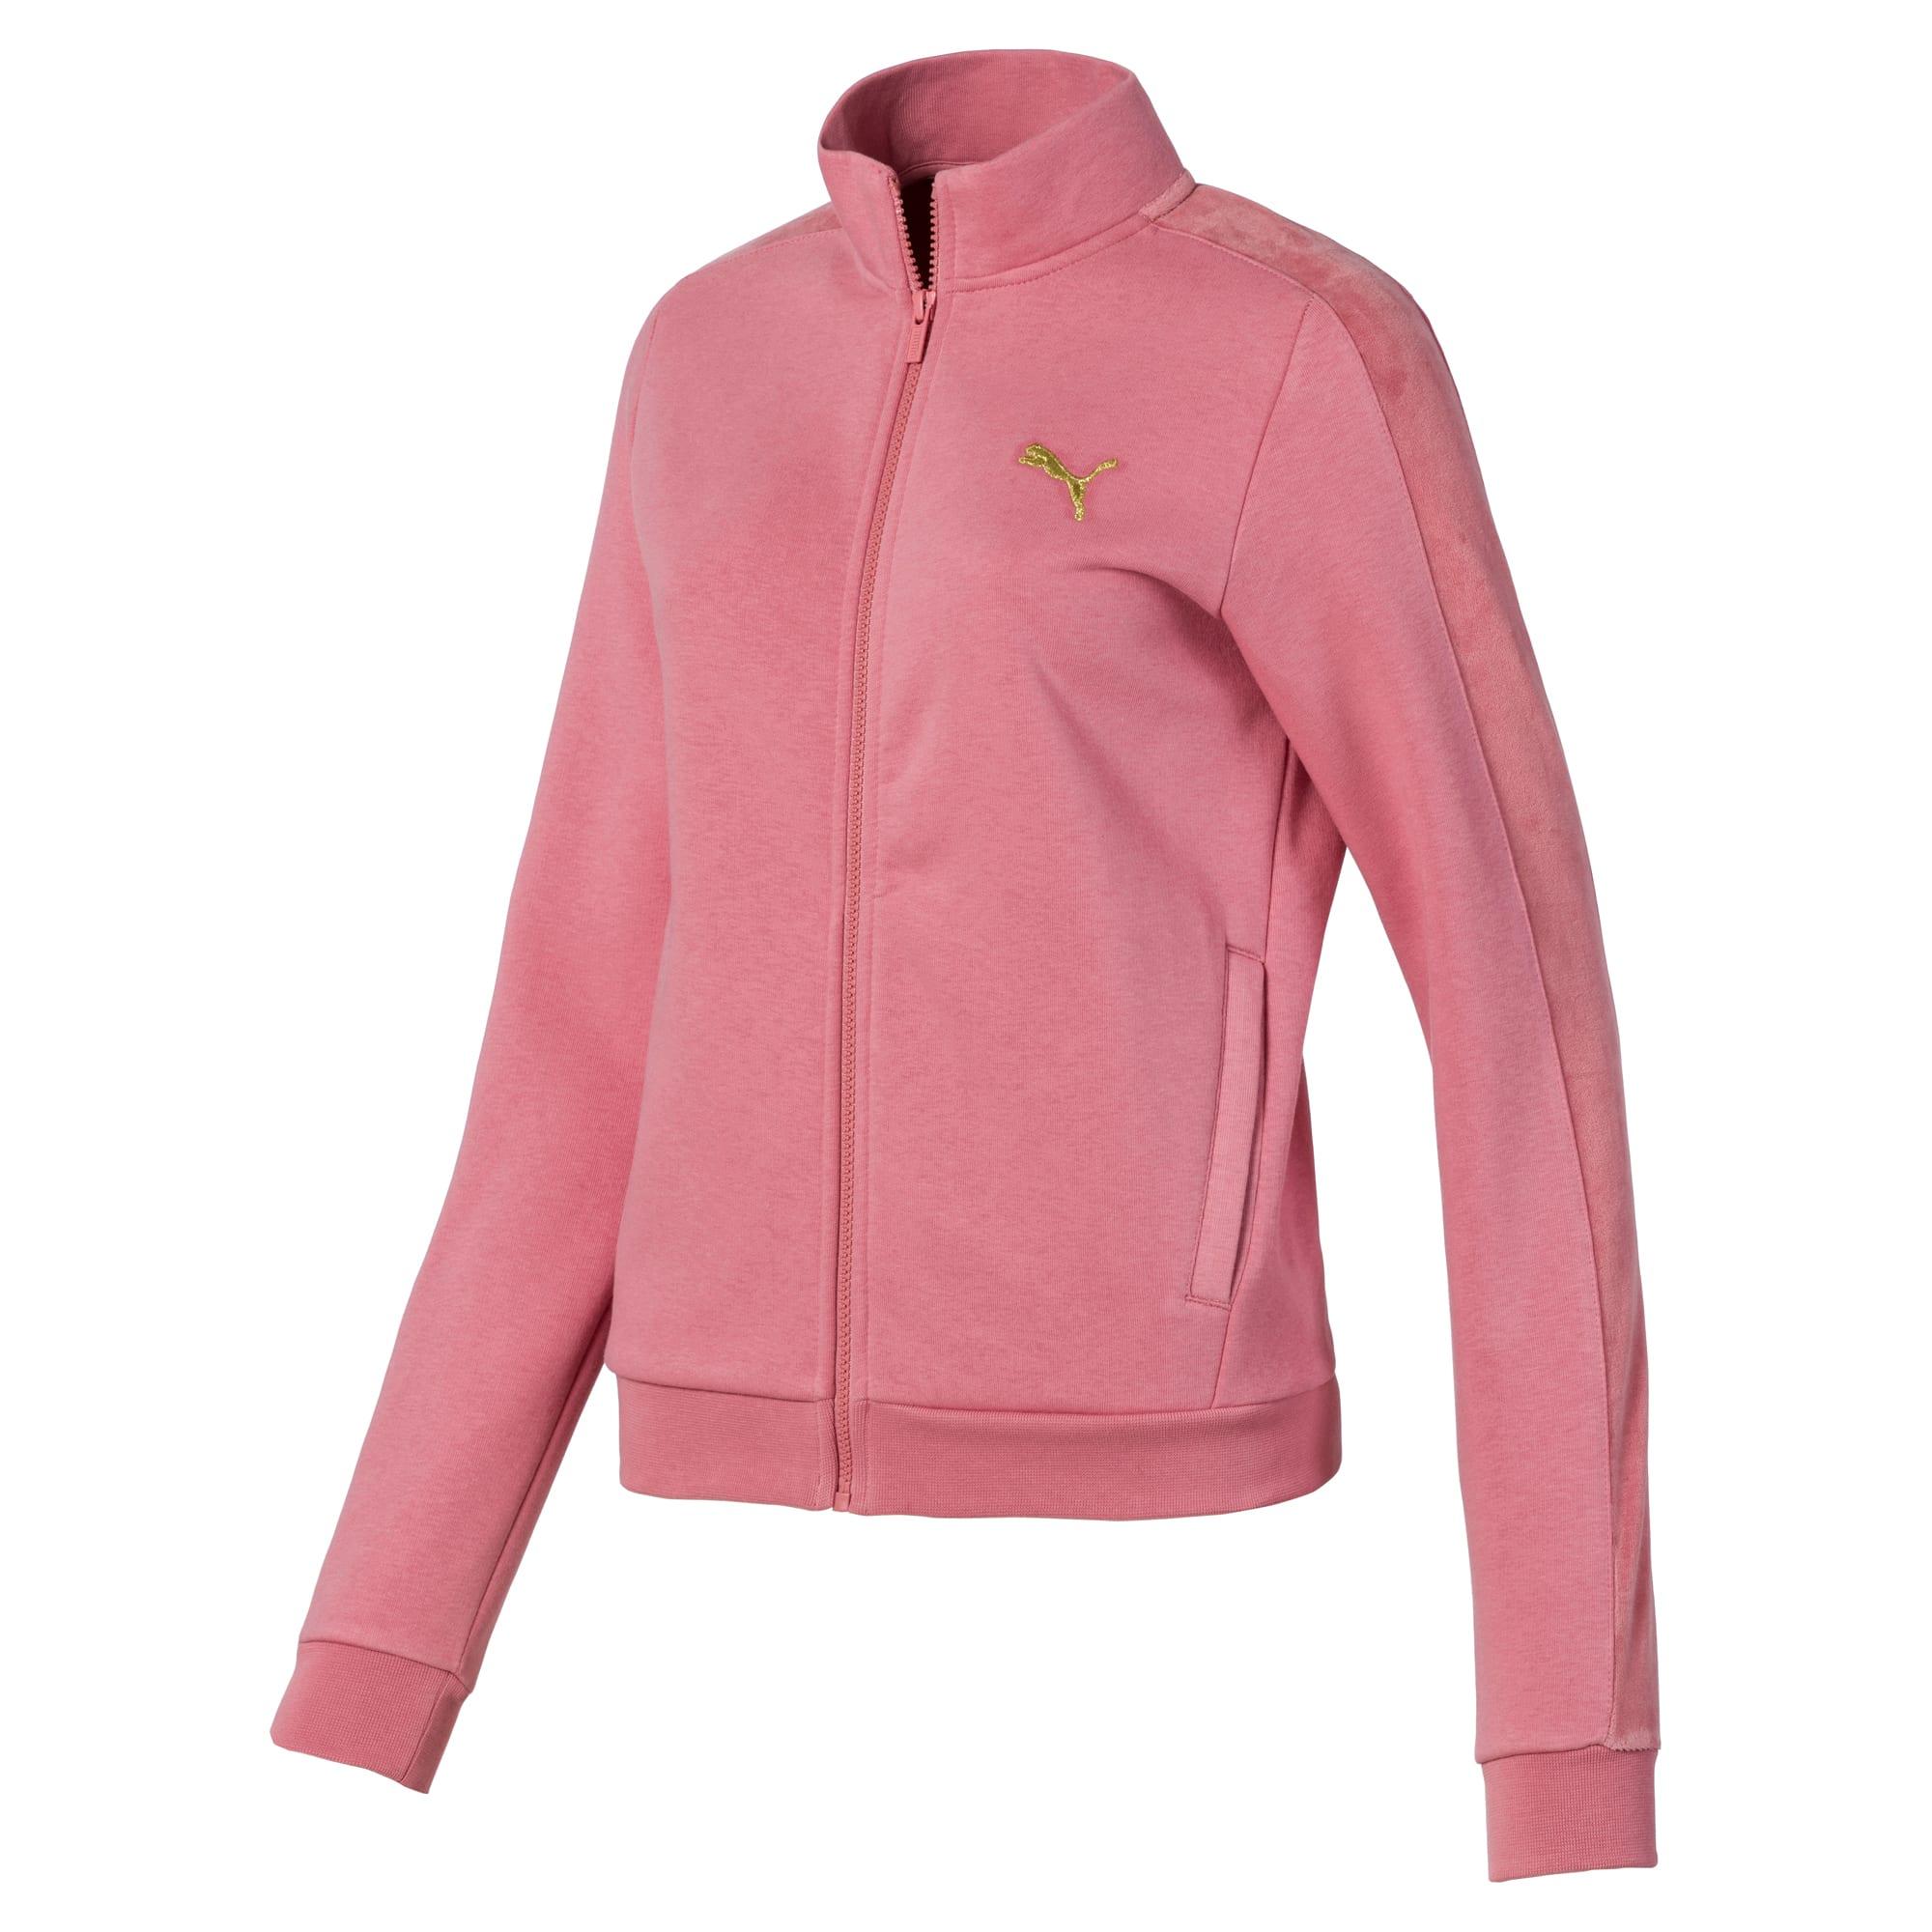 puma -  Damen Fleece Trainingsjacke | Mit Aucun | Größe: S